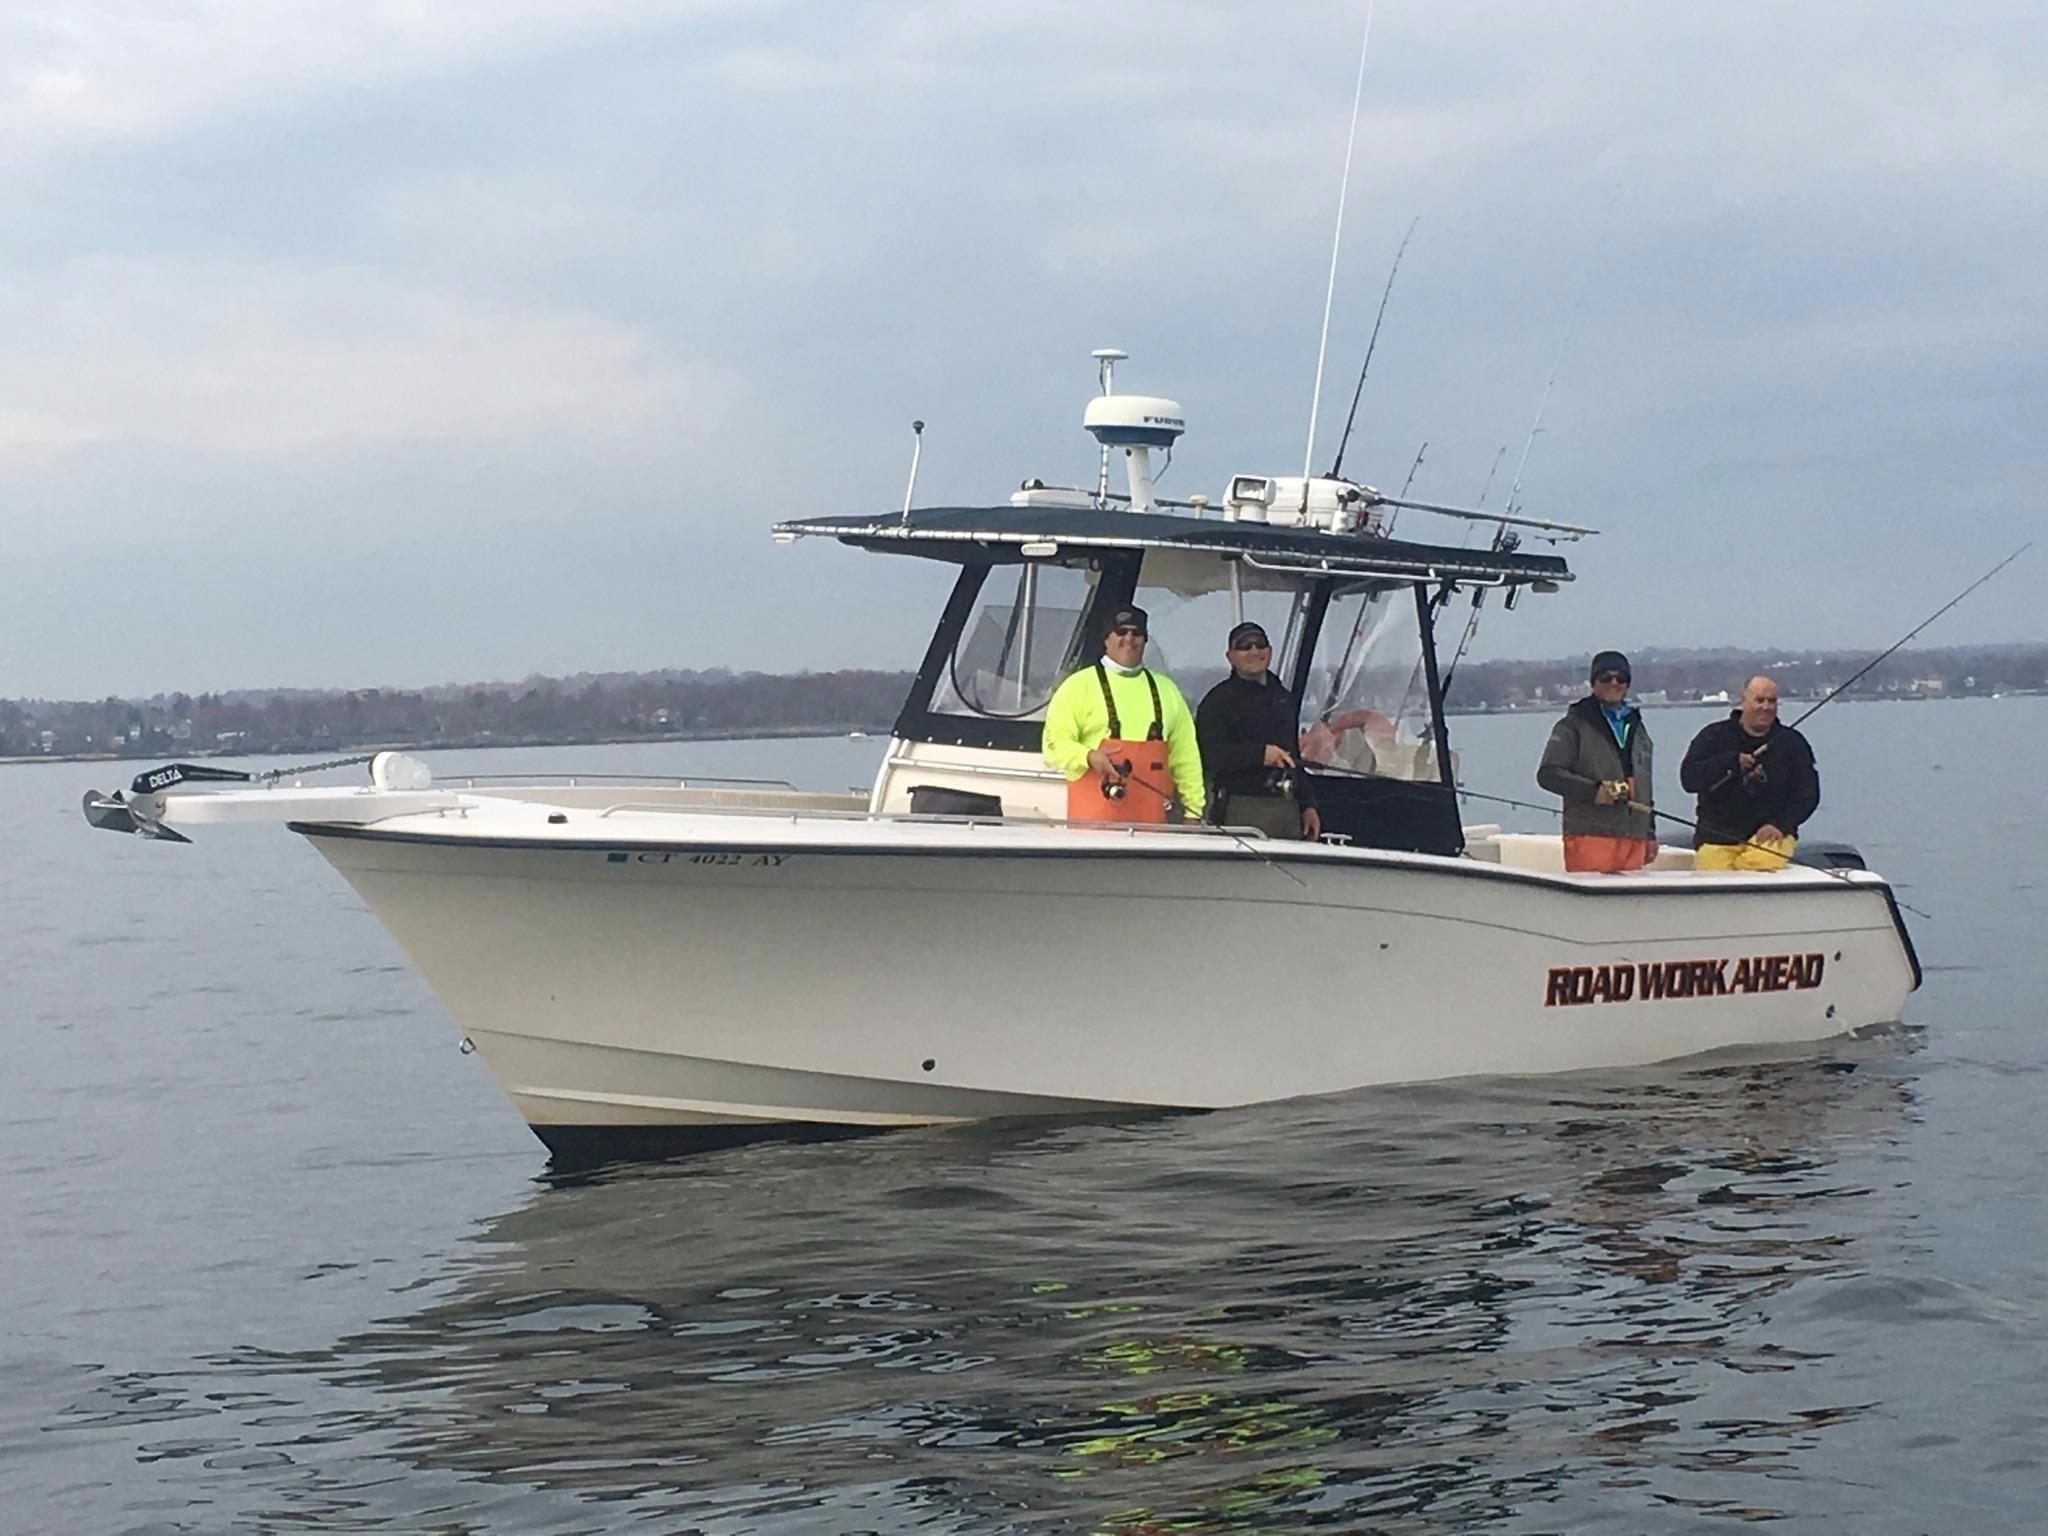 2003 grady white bimini 306 motore barca in vendita www for Bimini fishing charters